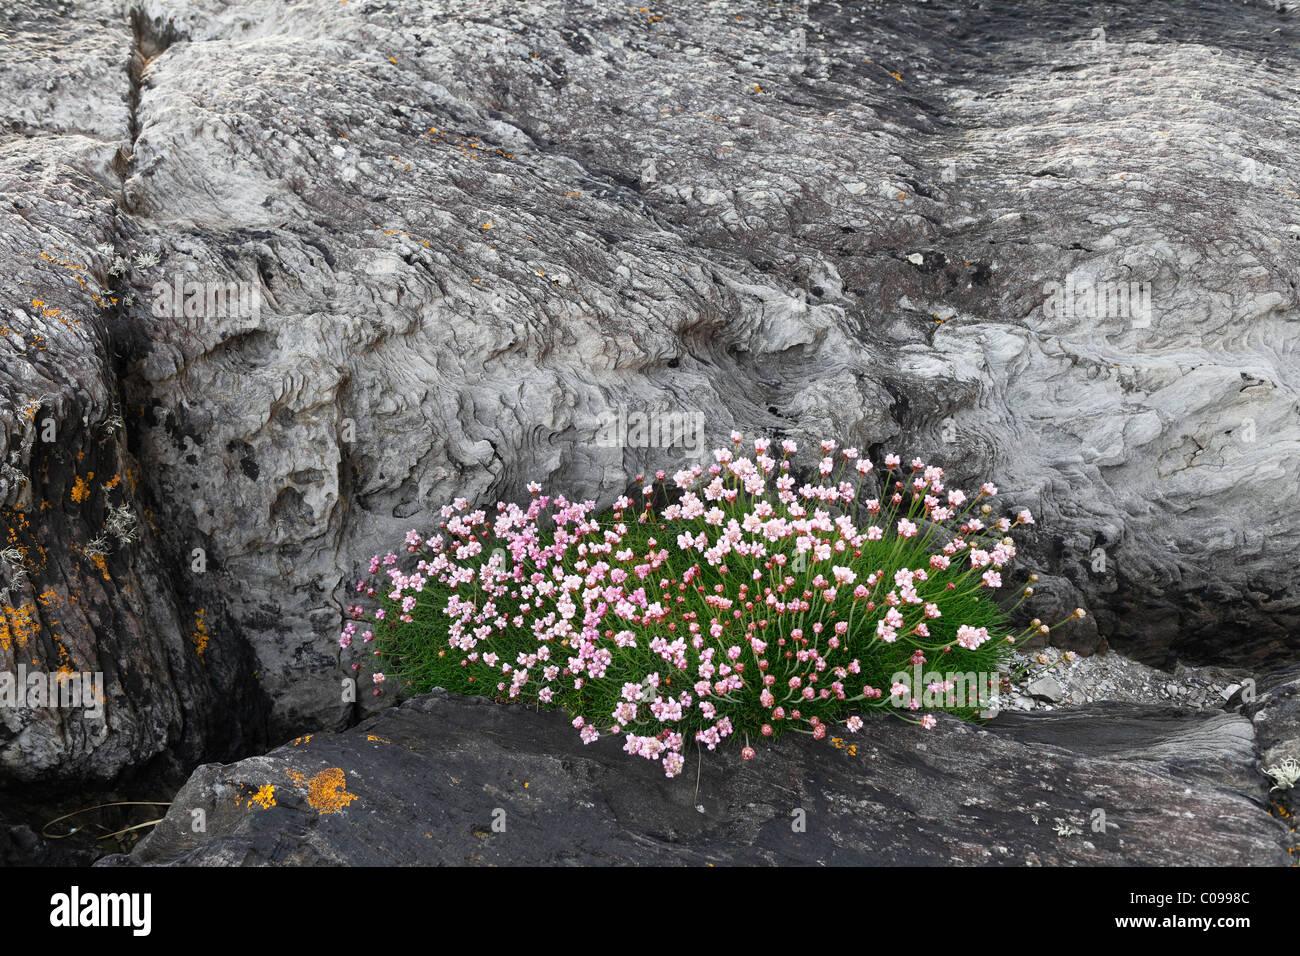 Thrift, Sea-pink (Armeria maritima) on rock, Beara Peninsula, Cork, Republic of Ireland, British Isles, Europe - Stock Image